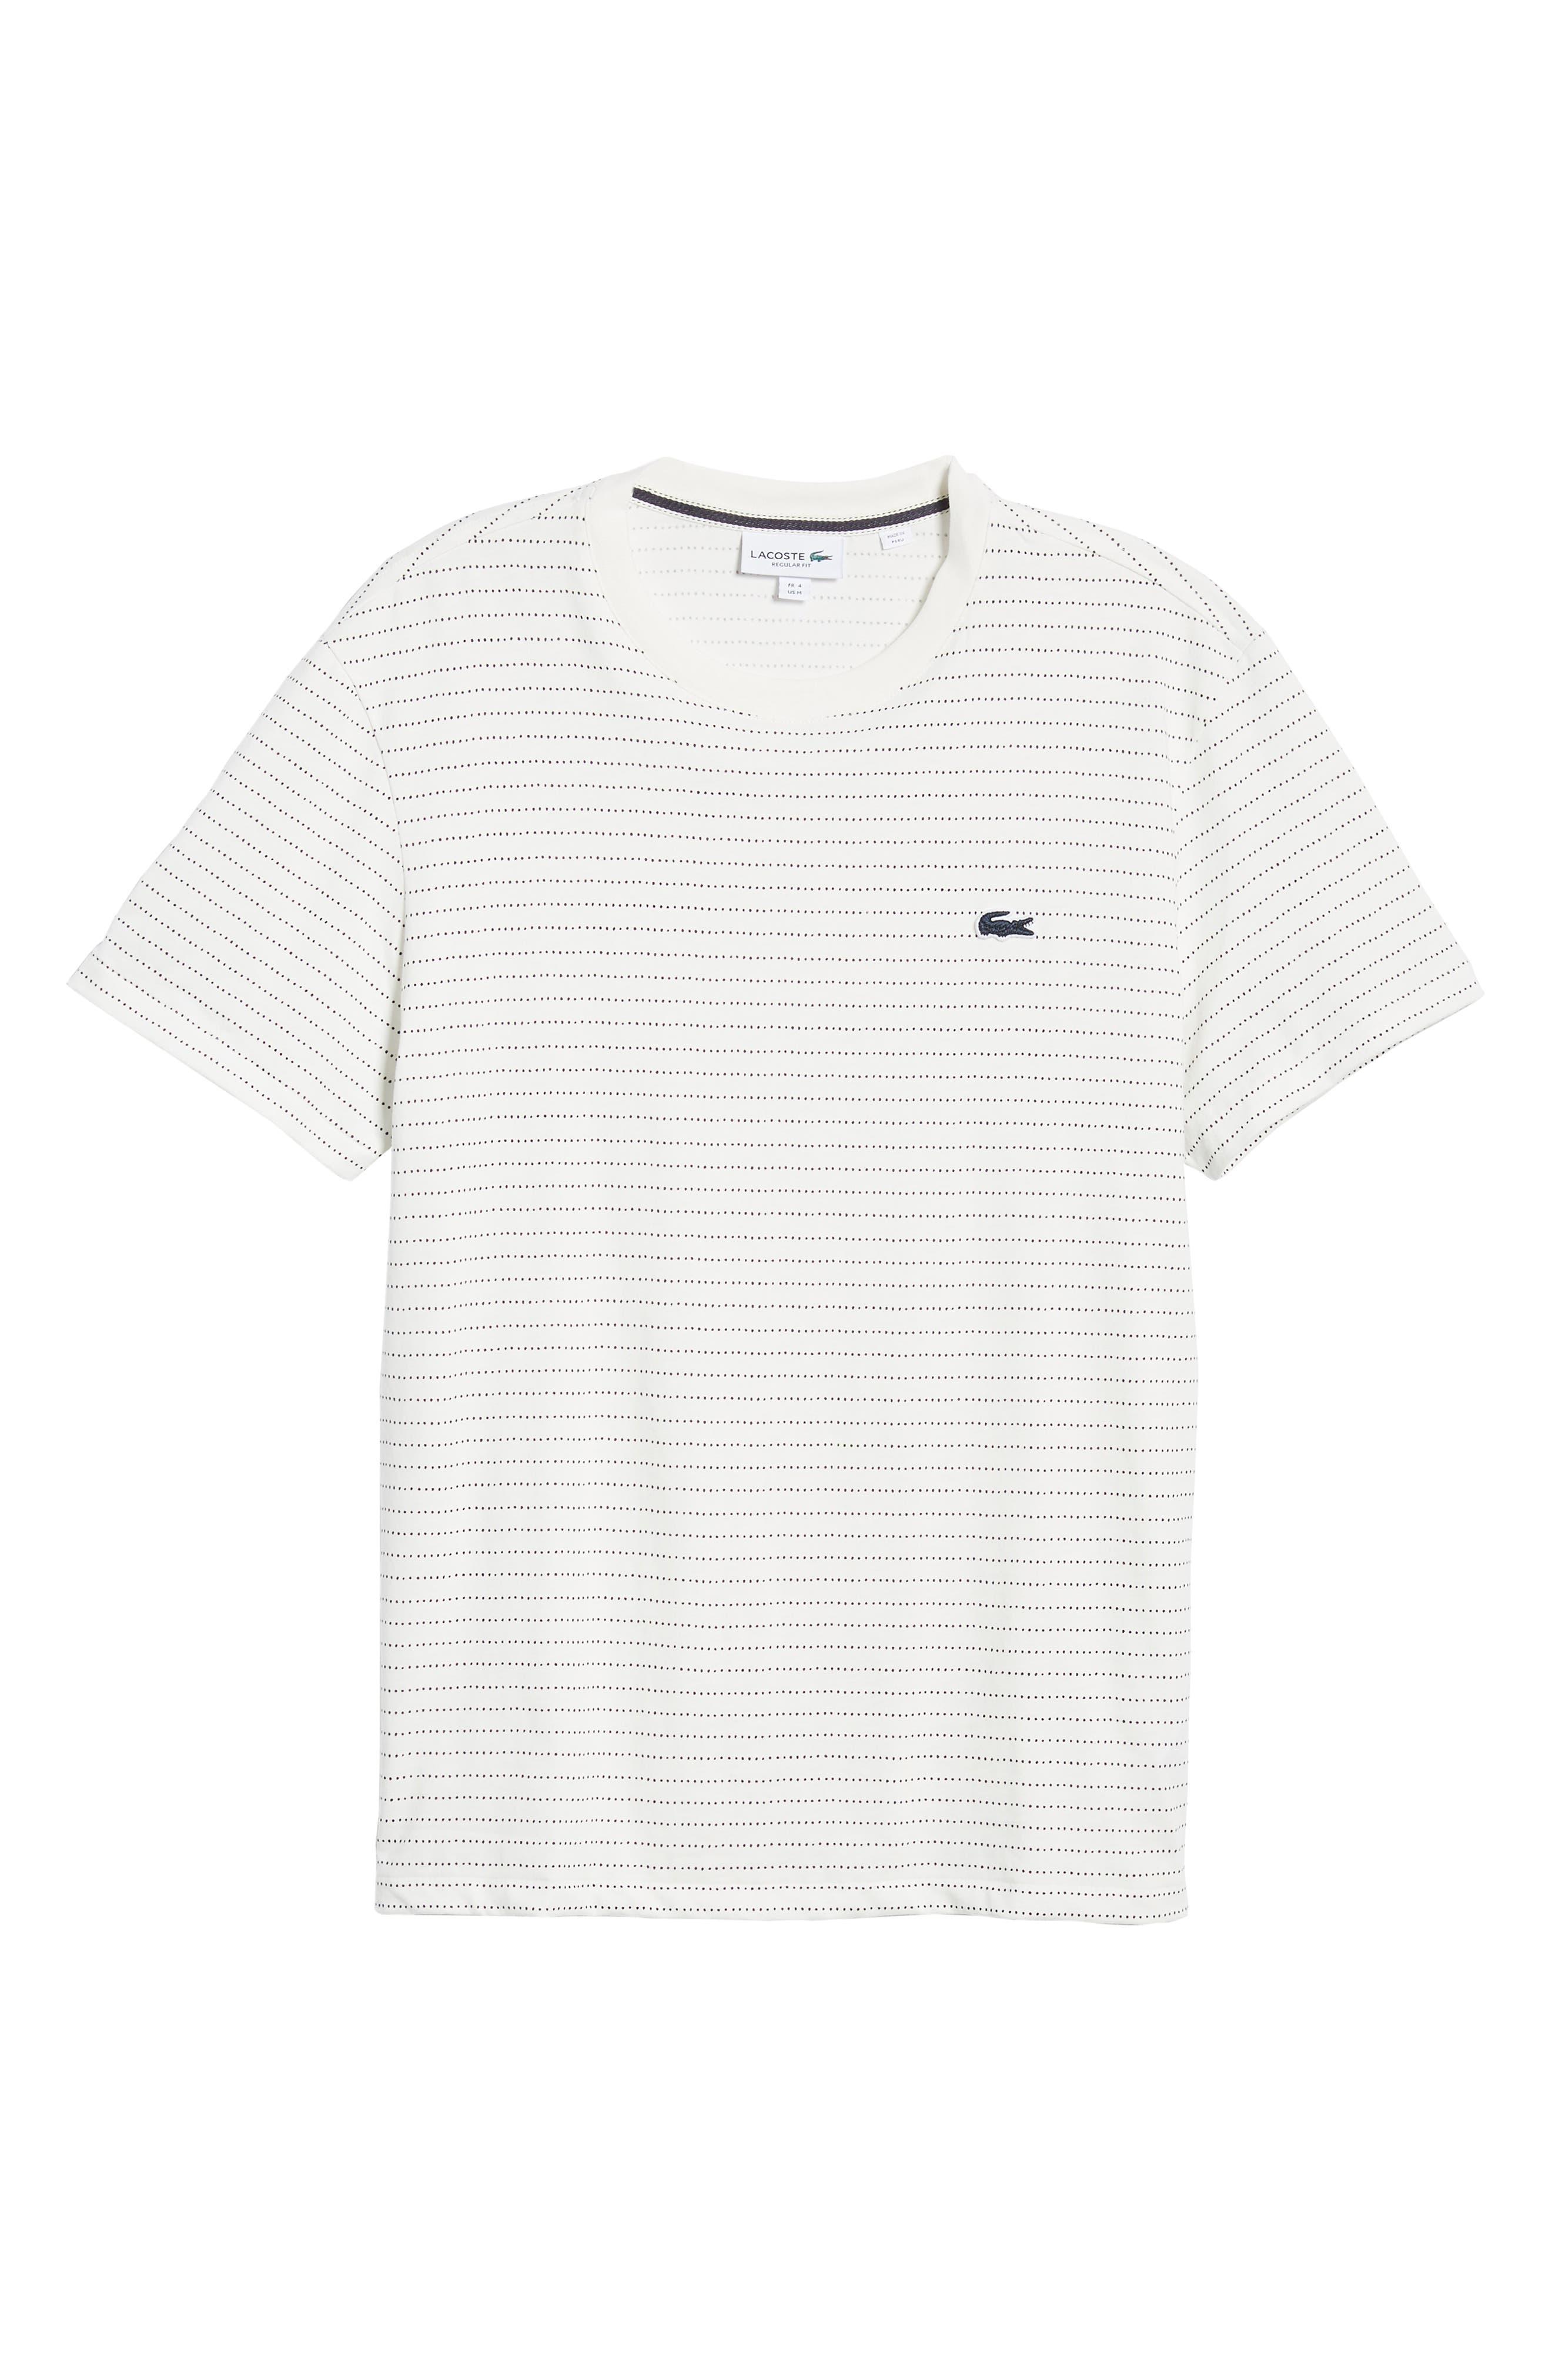 Dotted Stripe T-Shirt,                             Alternate thumbnail 6, color,                             FLOUR/ NAVY BLUE